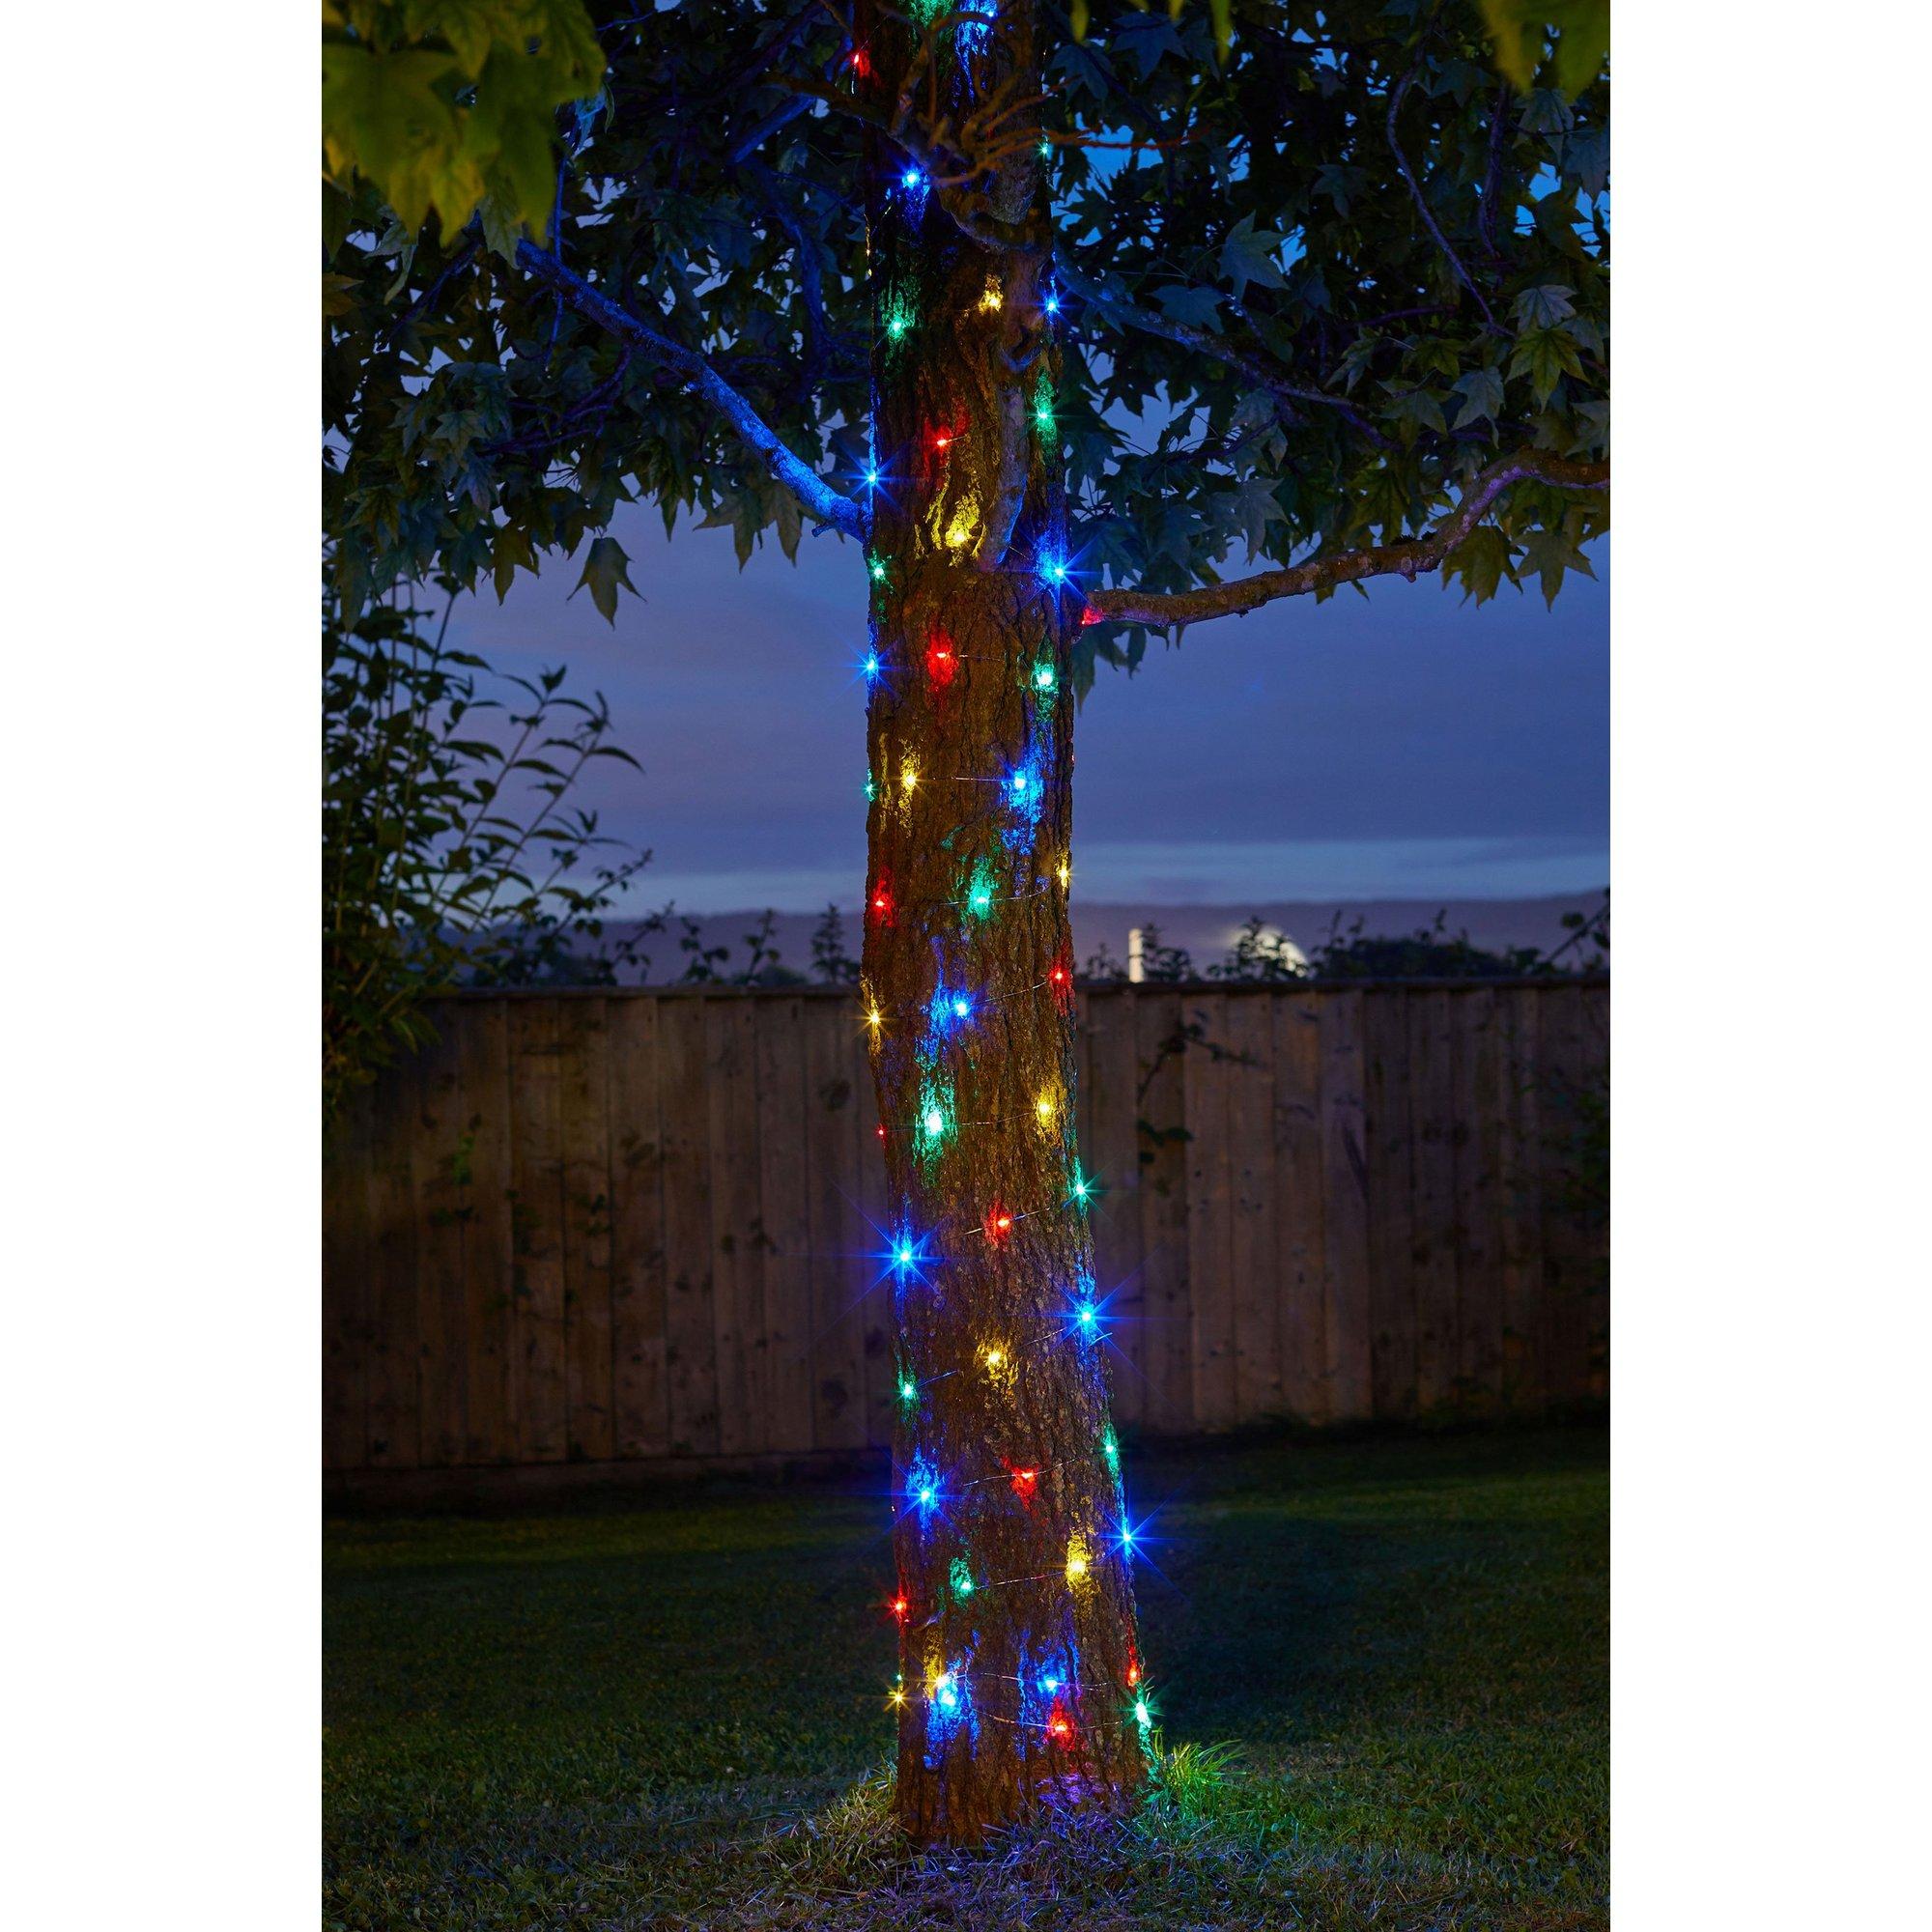 Image of 100 LED Firefly String Lights